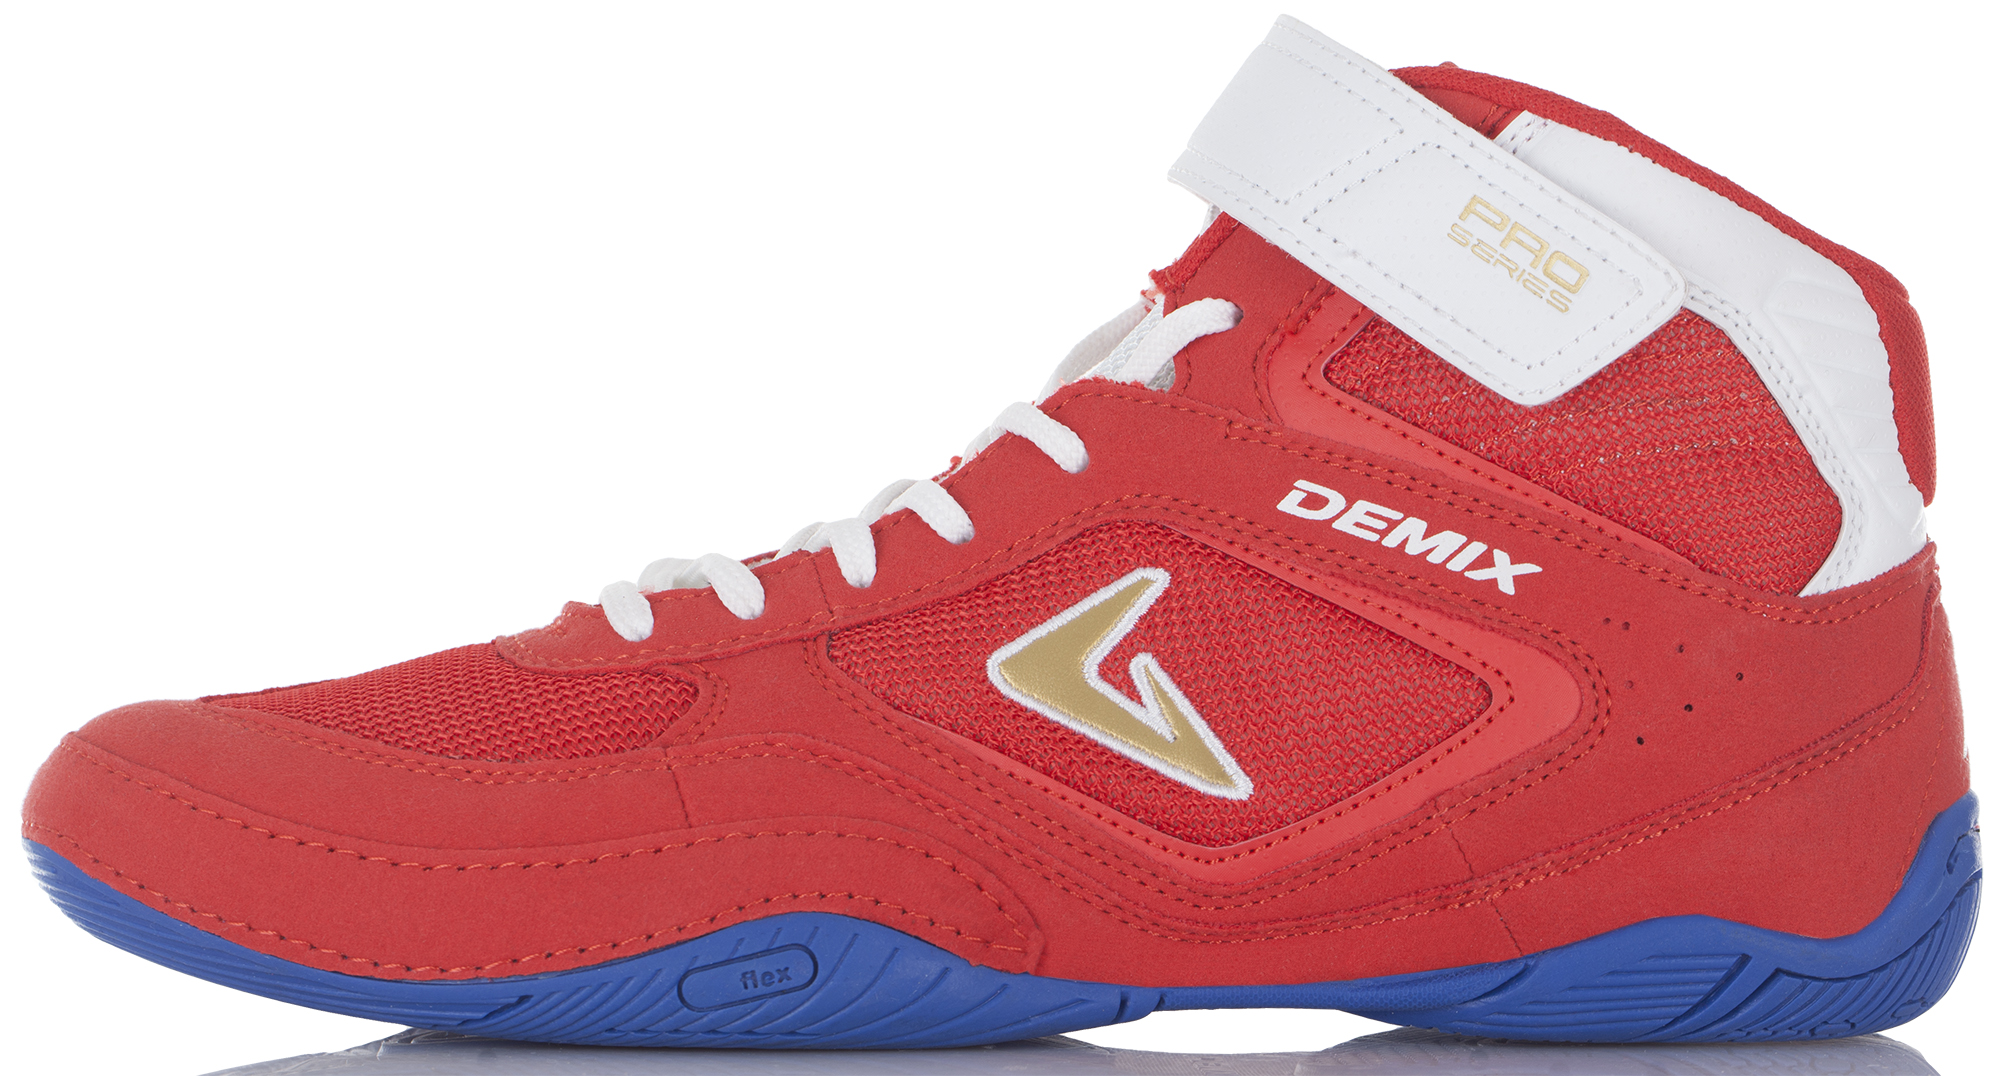 Demix Борцовки мужские Demix Buivassar, размер 46 борцовки adidas combat speed 5 серо желтые ba8006